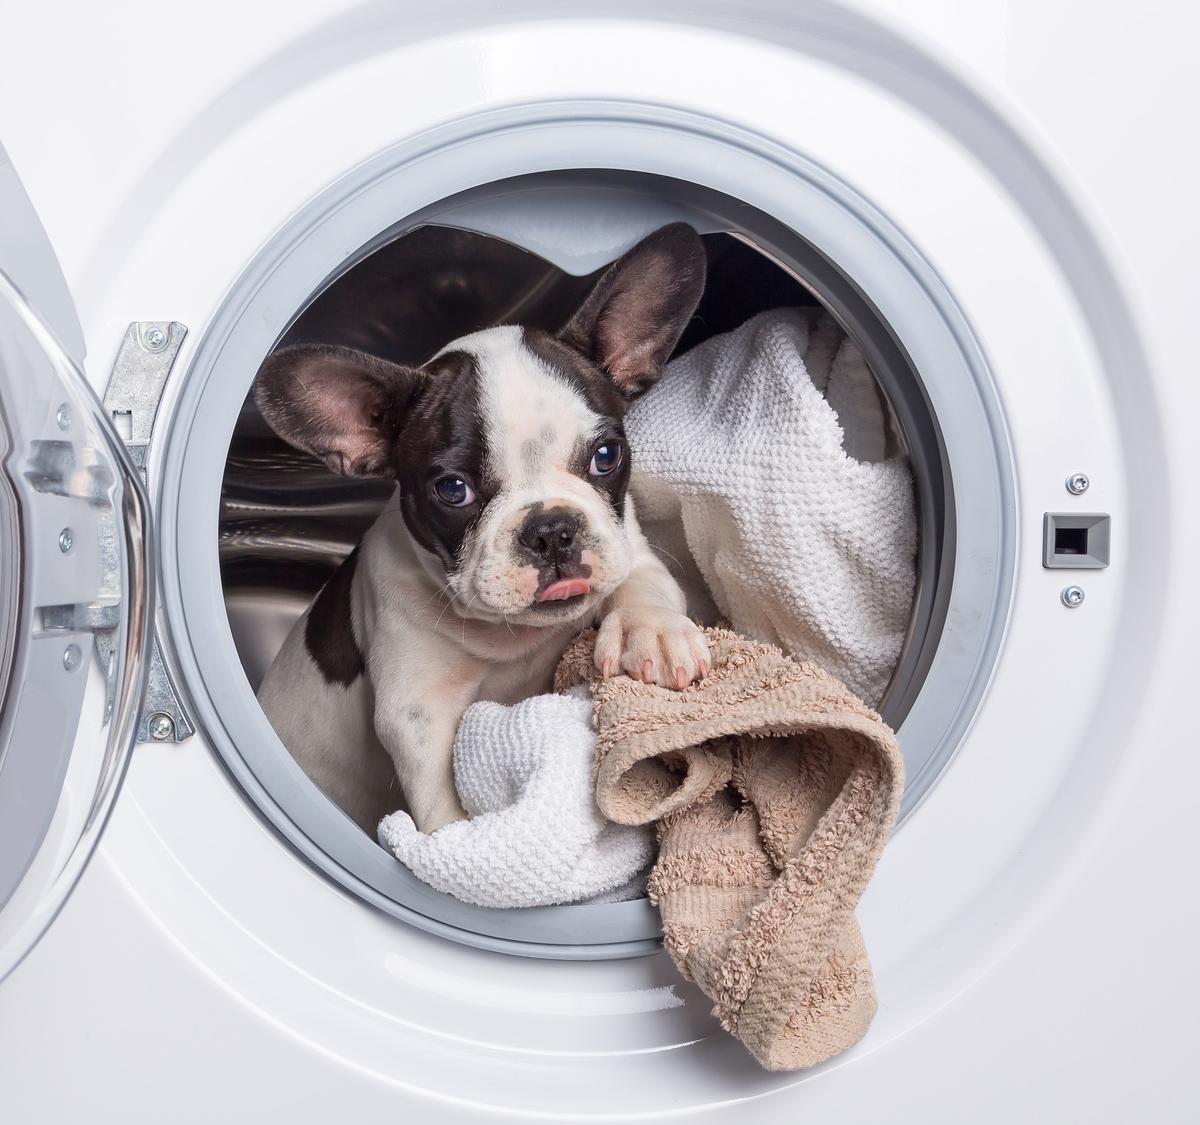 Stoke on trent new washing machines Bulldog, French